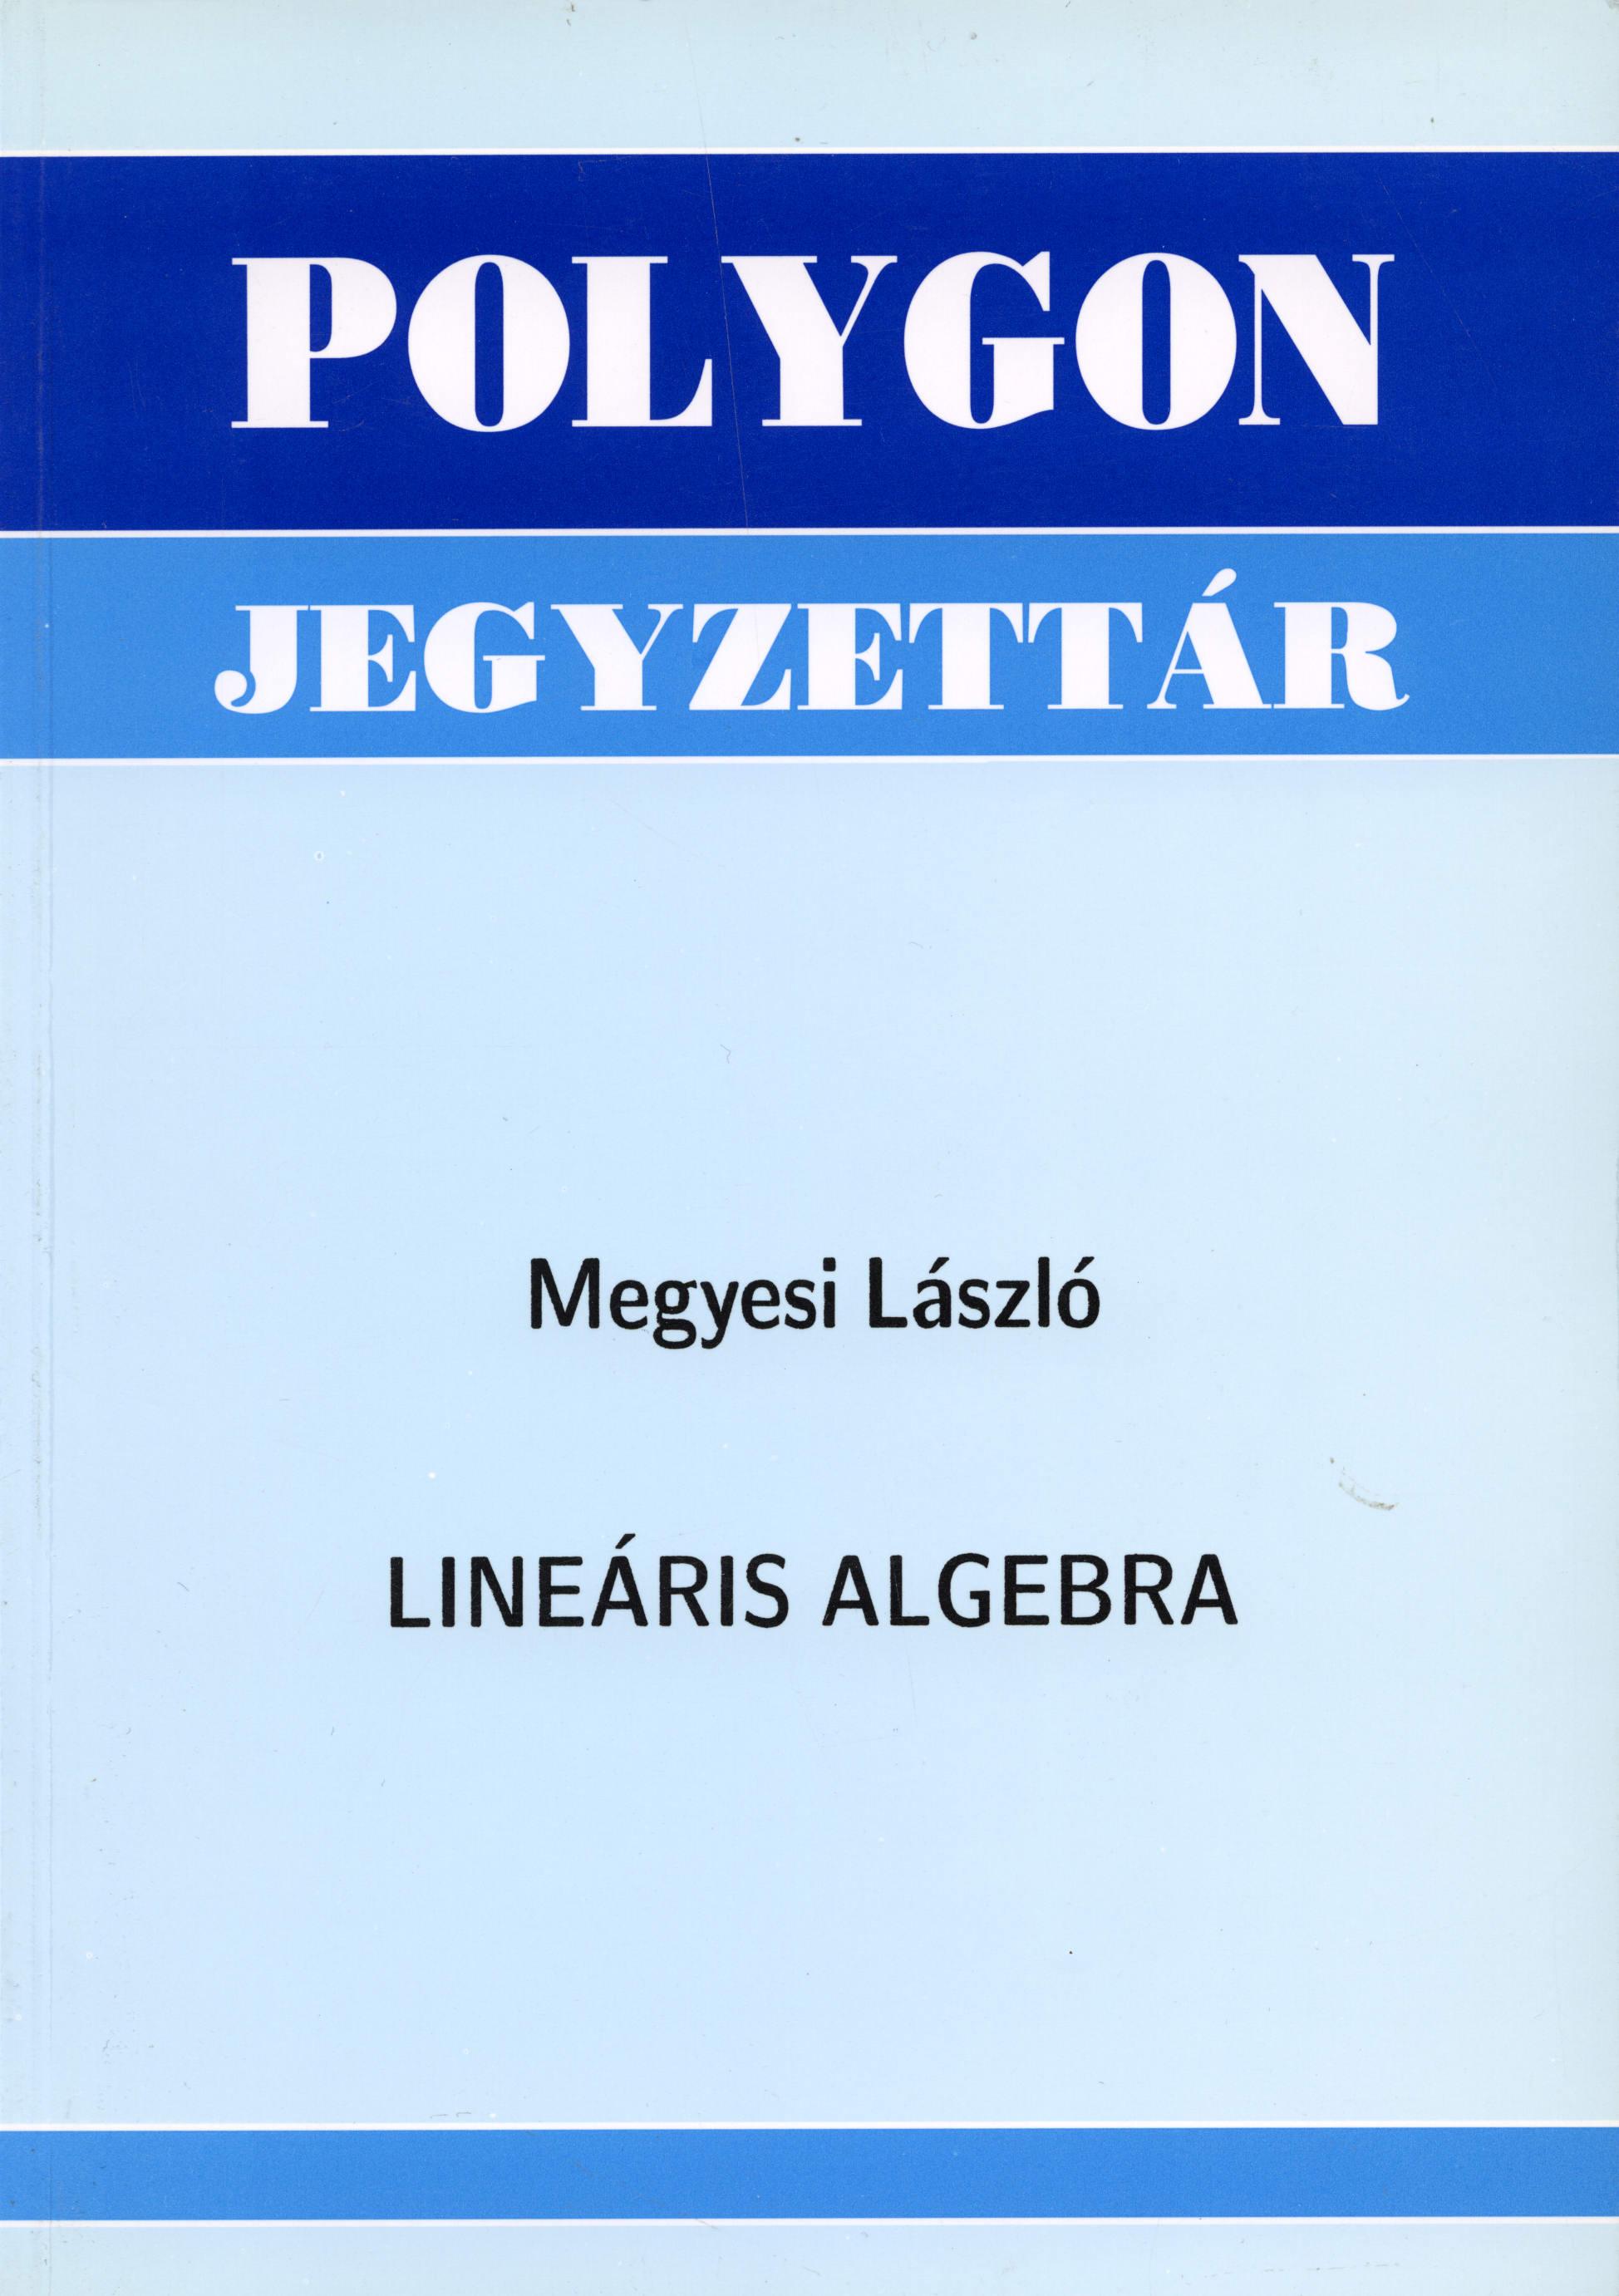 Lineáris algebra - Polygon jegyzet